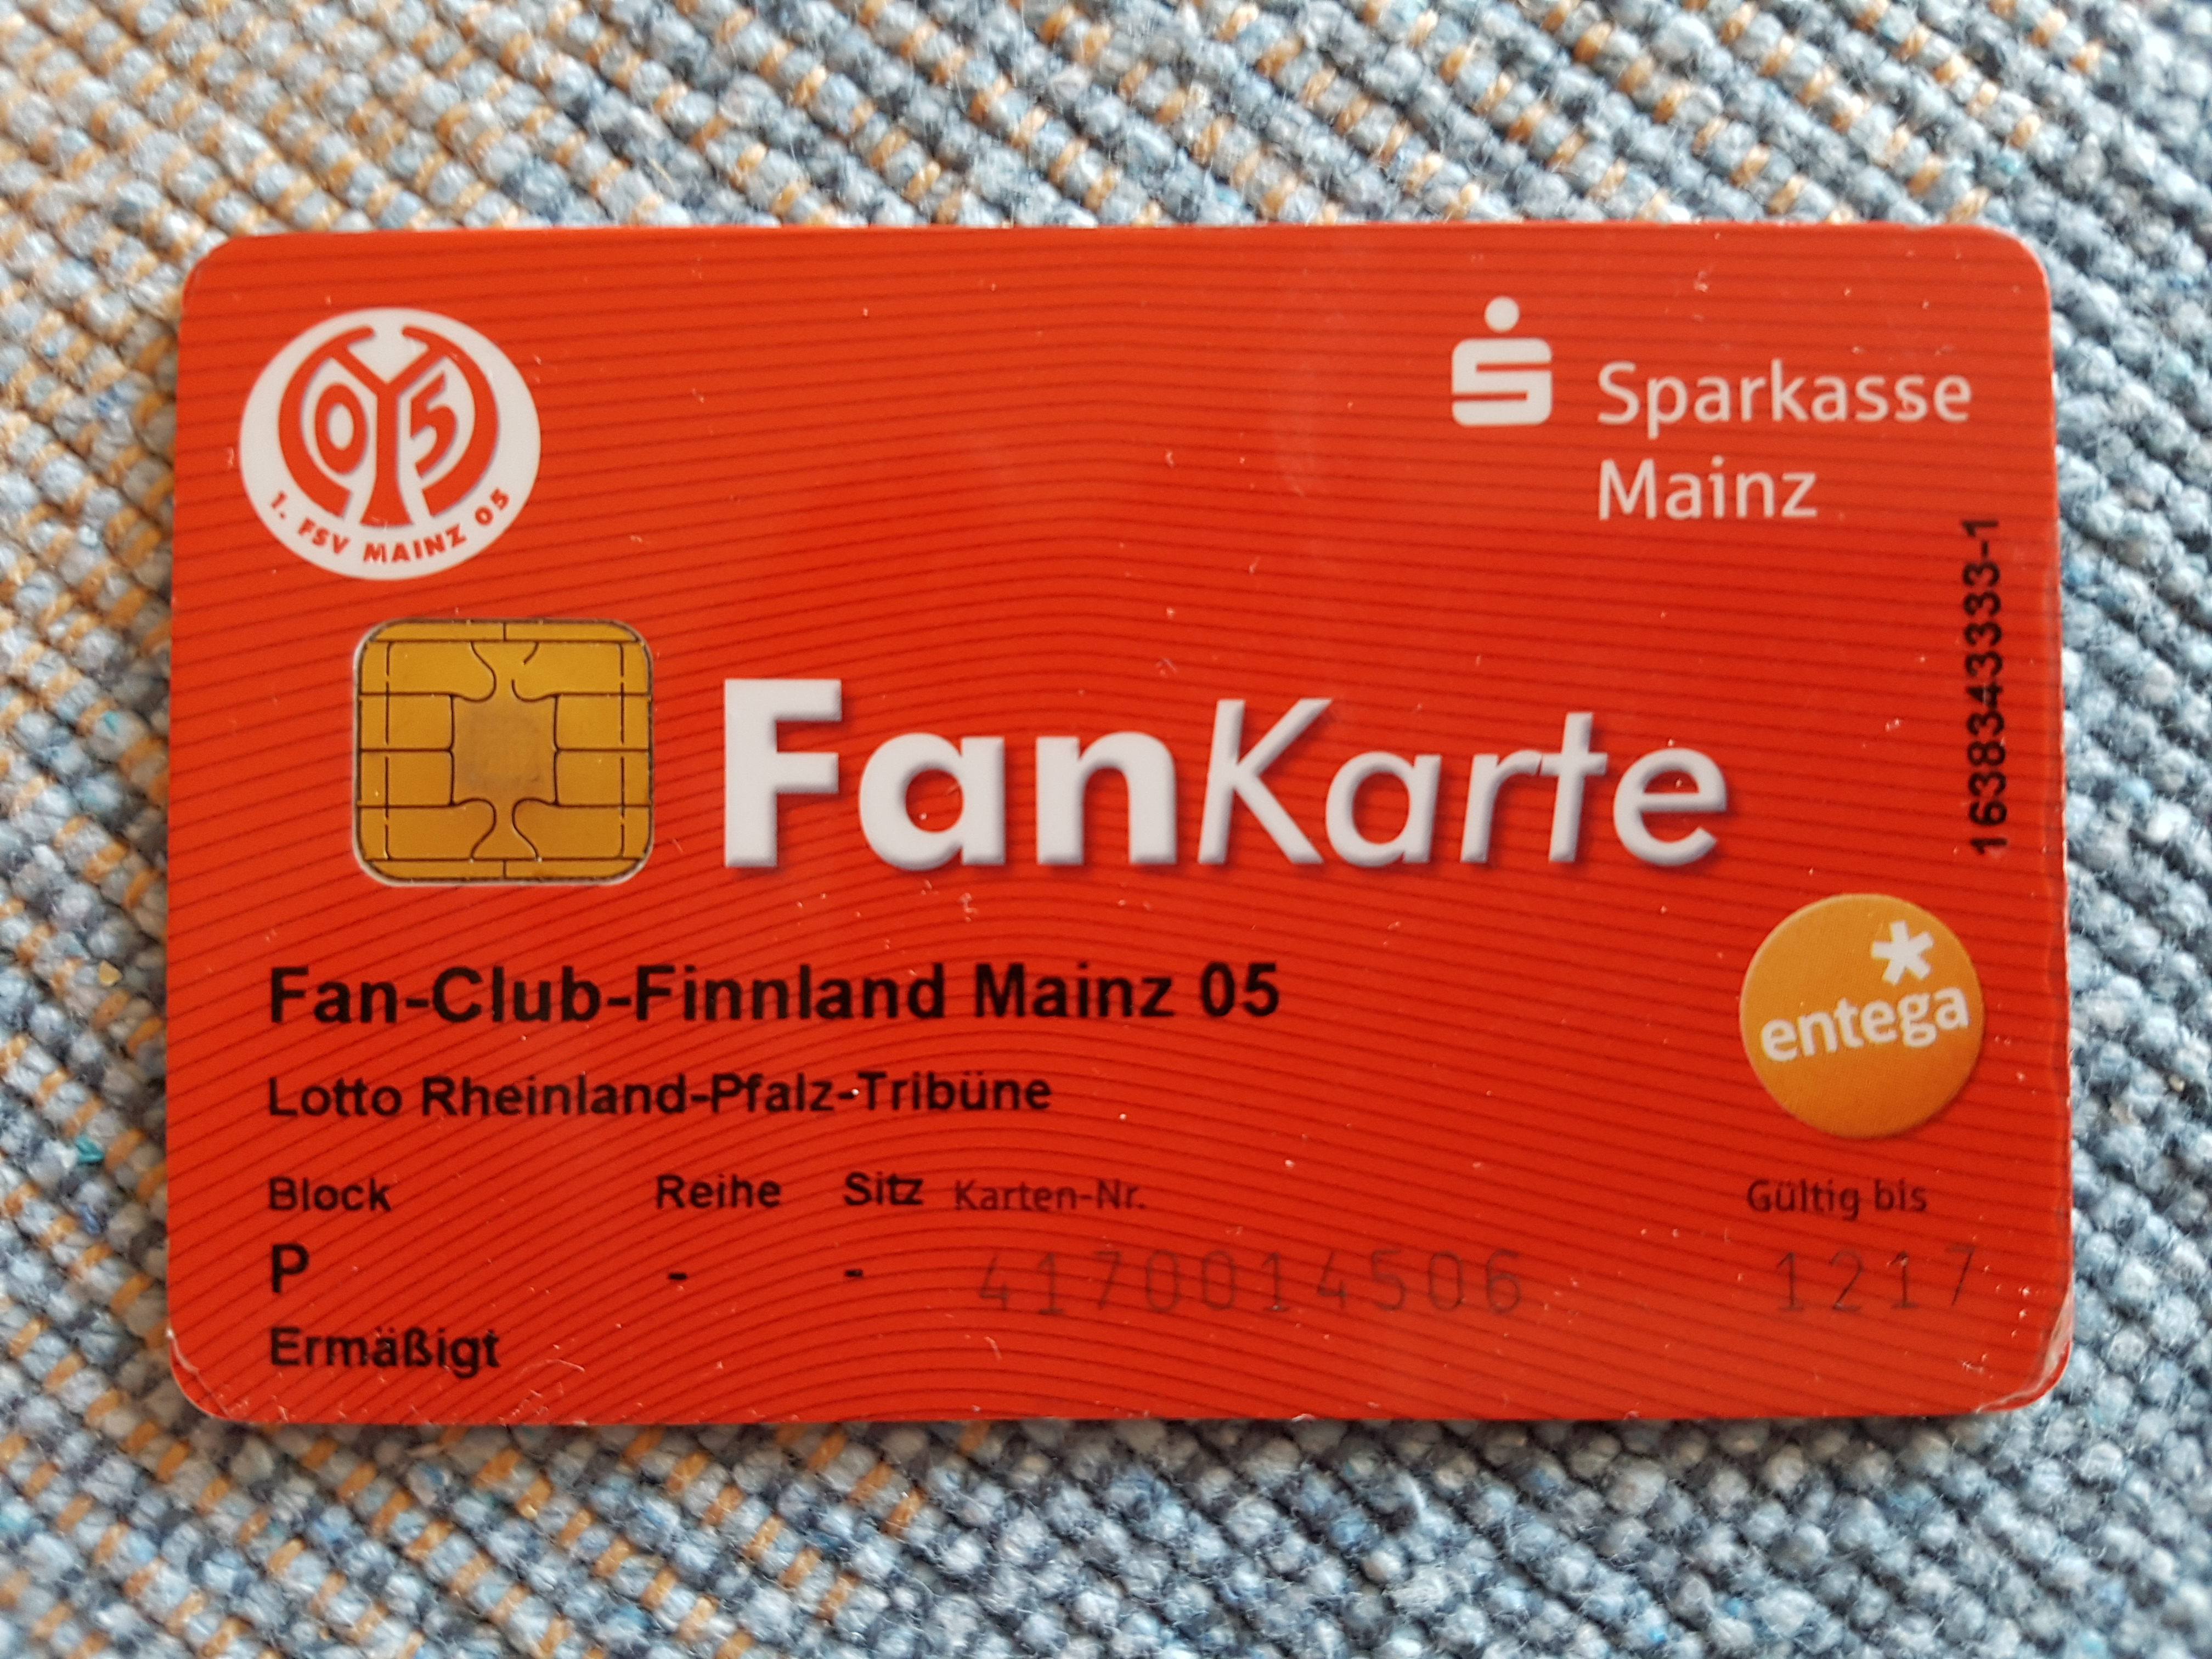 Die FanKarte des Fan-Club-Finnland Mainz 05